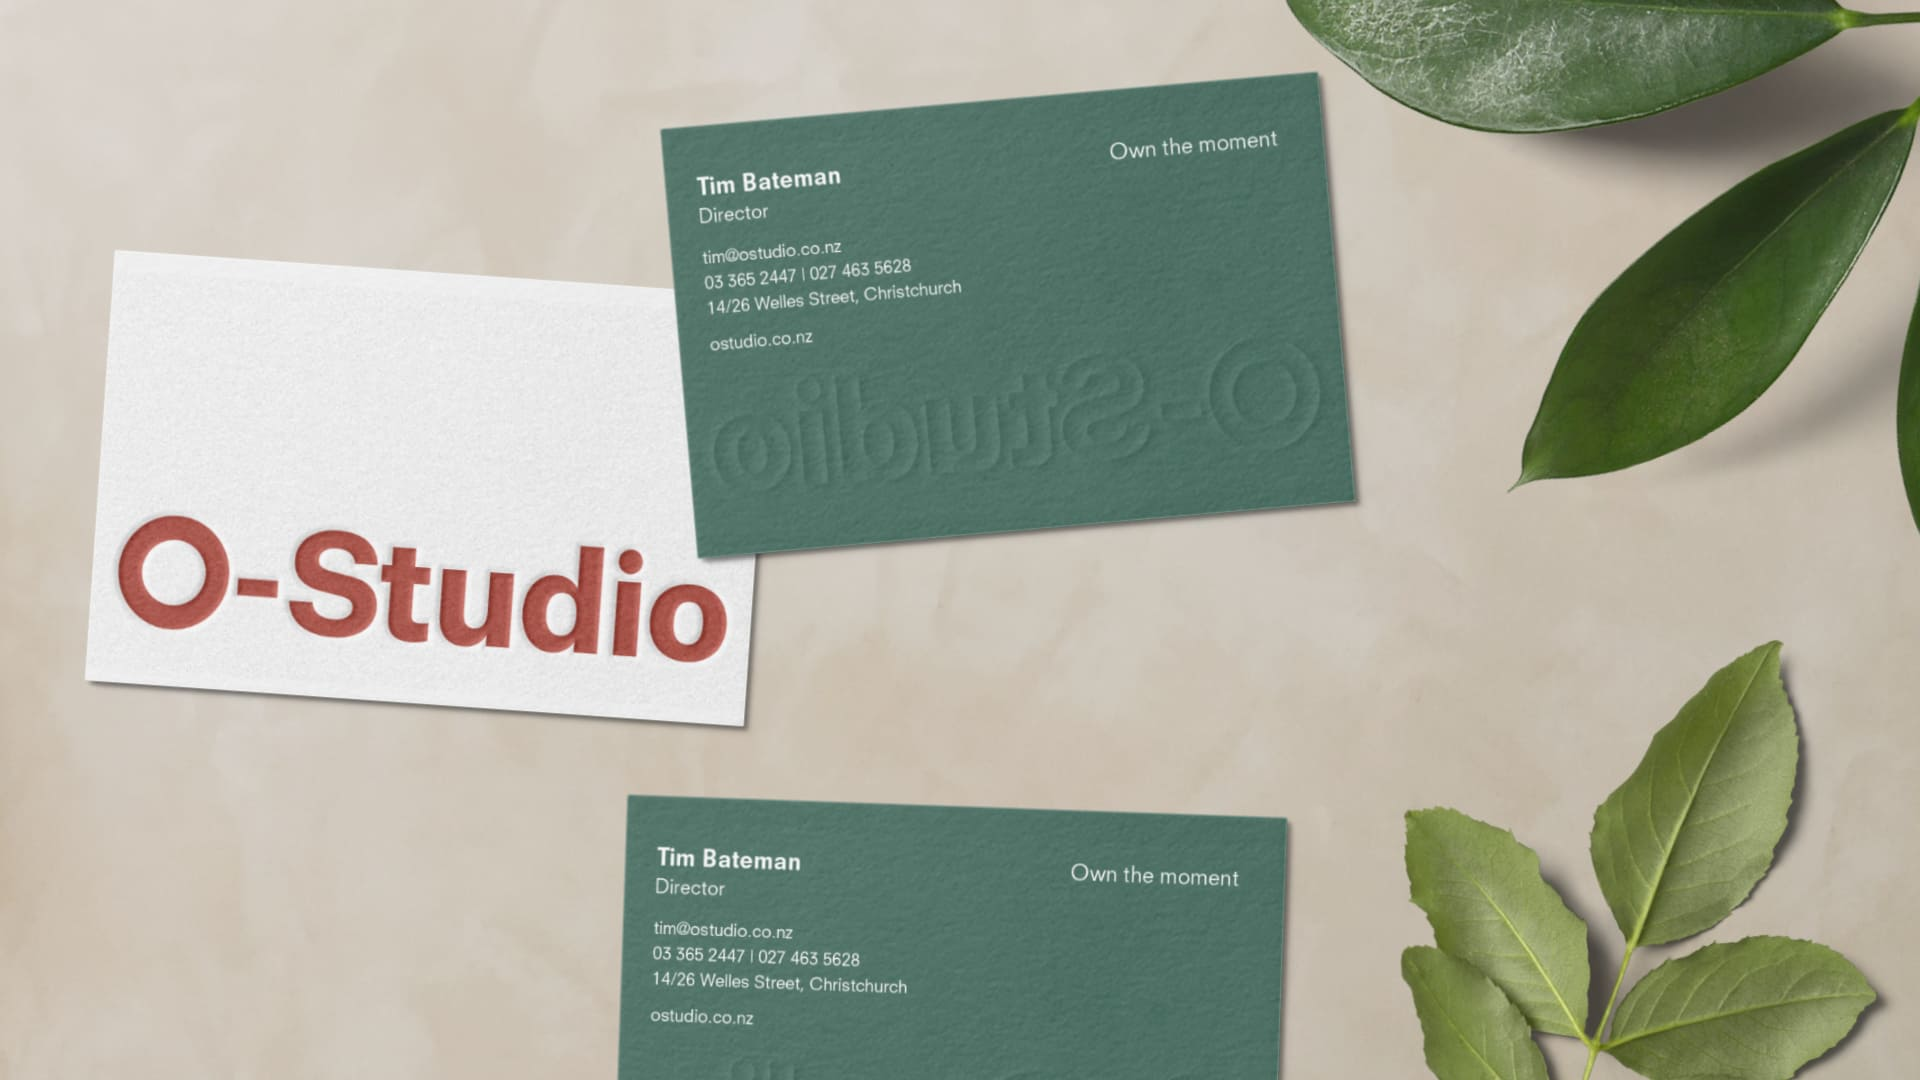 attraction studio o-studio brand business cards